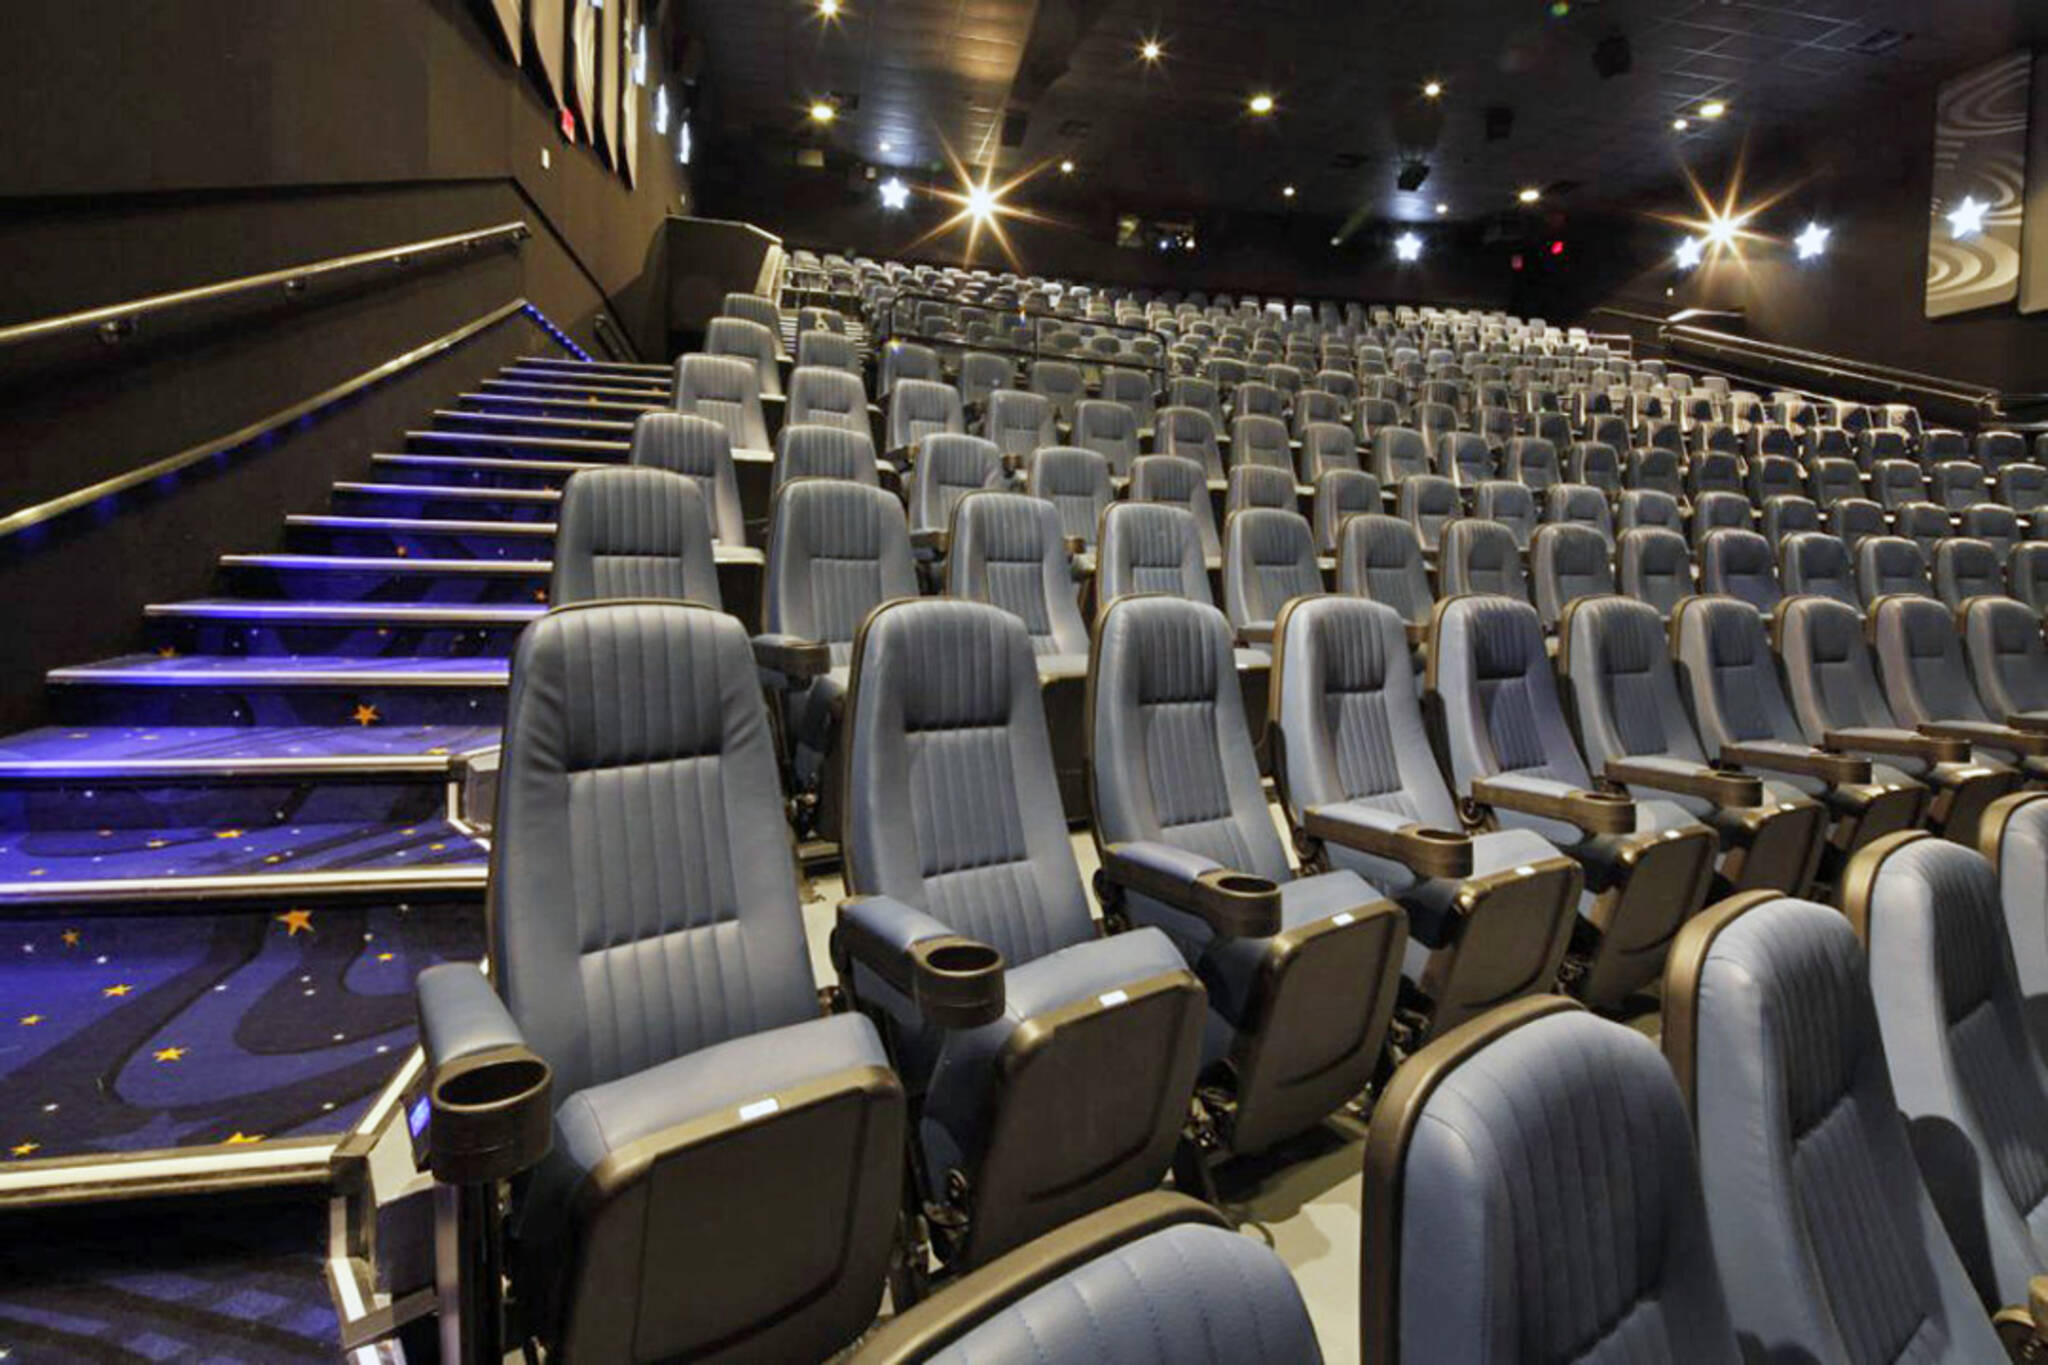 toronto imax theatre